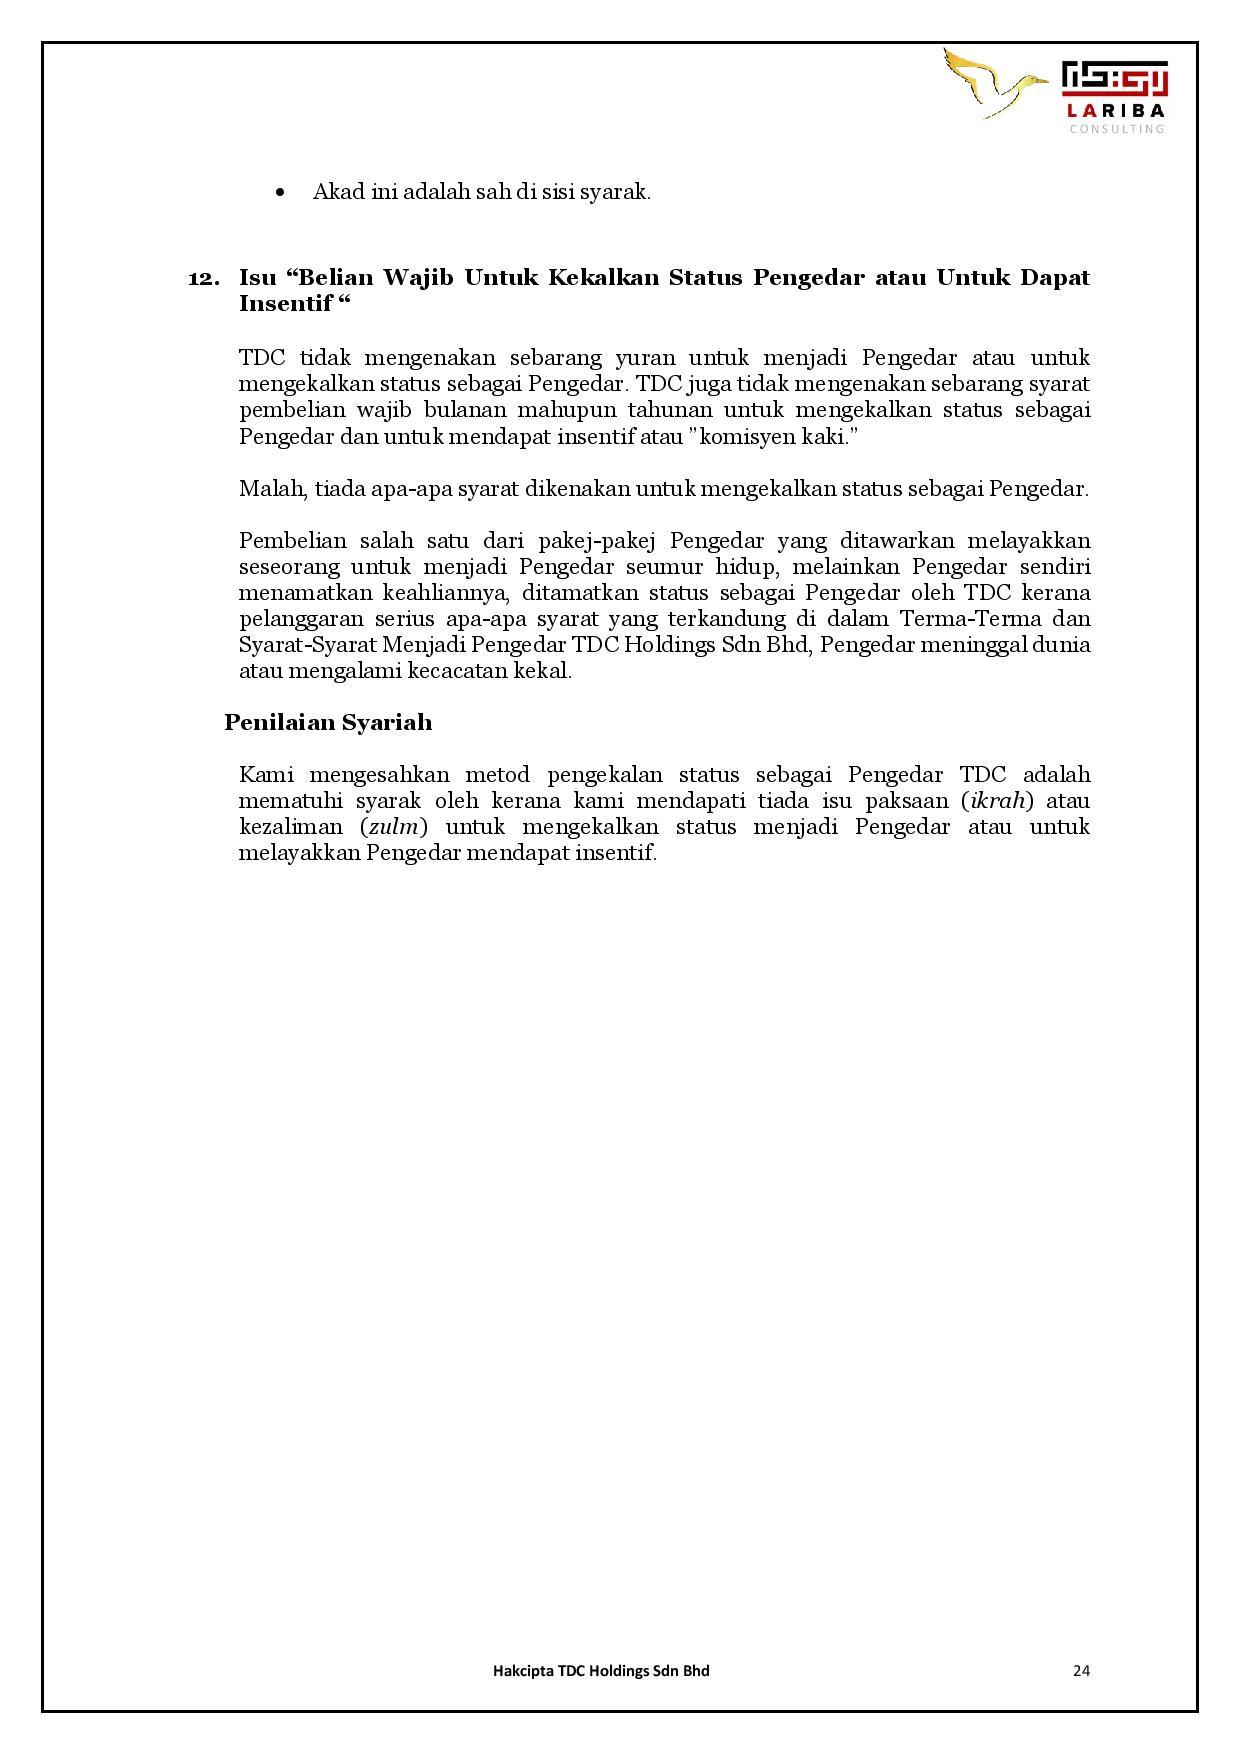 Huraian Penilaian Syariah TDC 210121 (1)-page-024